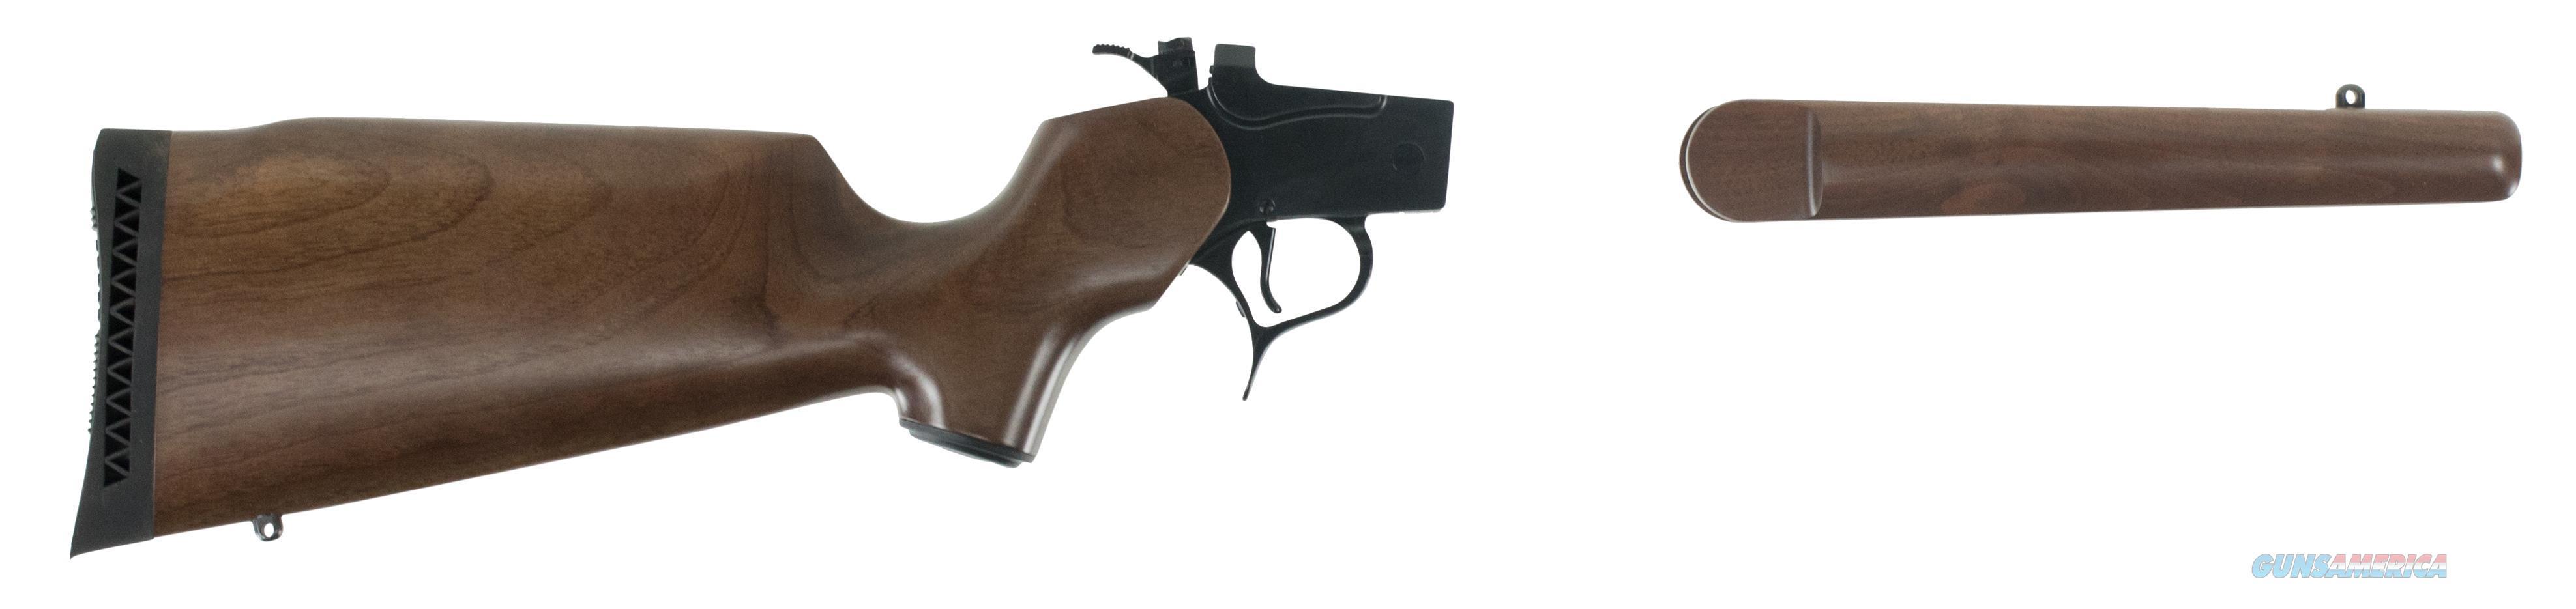 Thompson Center Rifle Frame Contender G2 Blued Walnut 08028720  Guns > Rifles > TU Misc Rifles